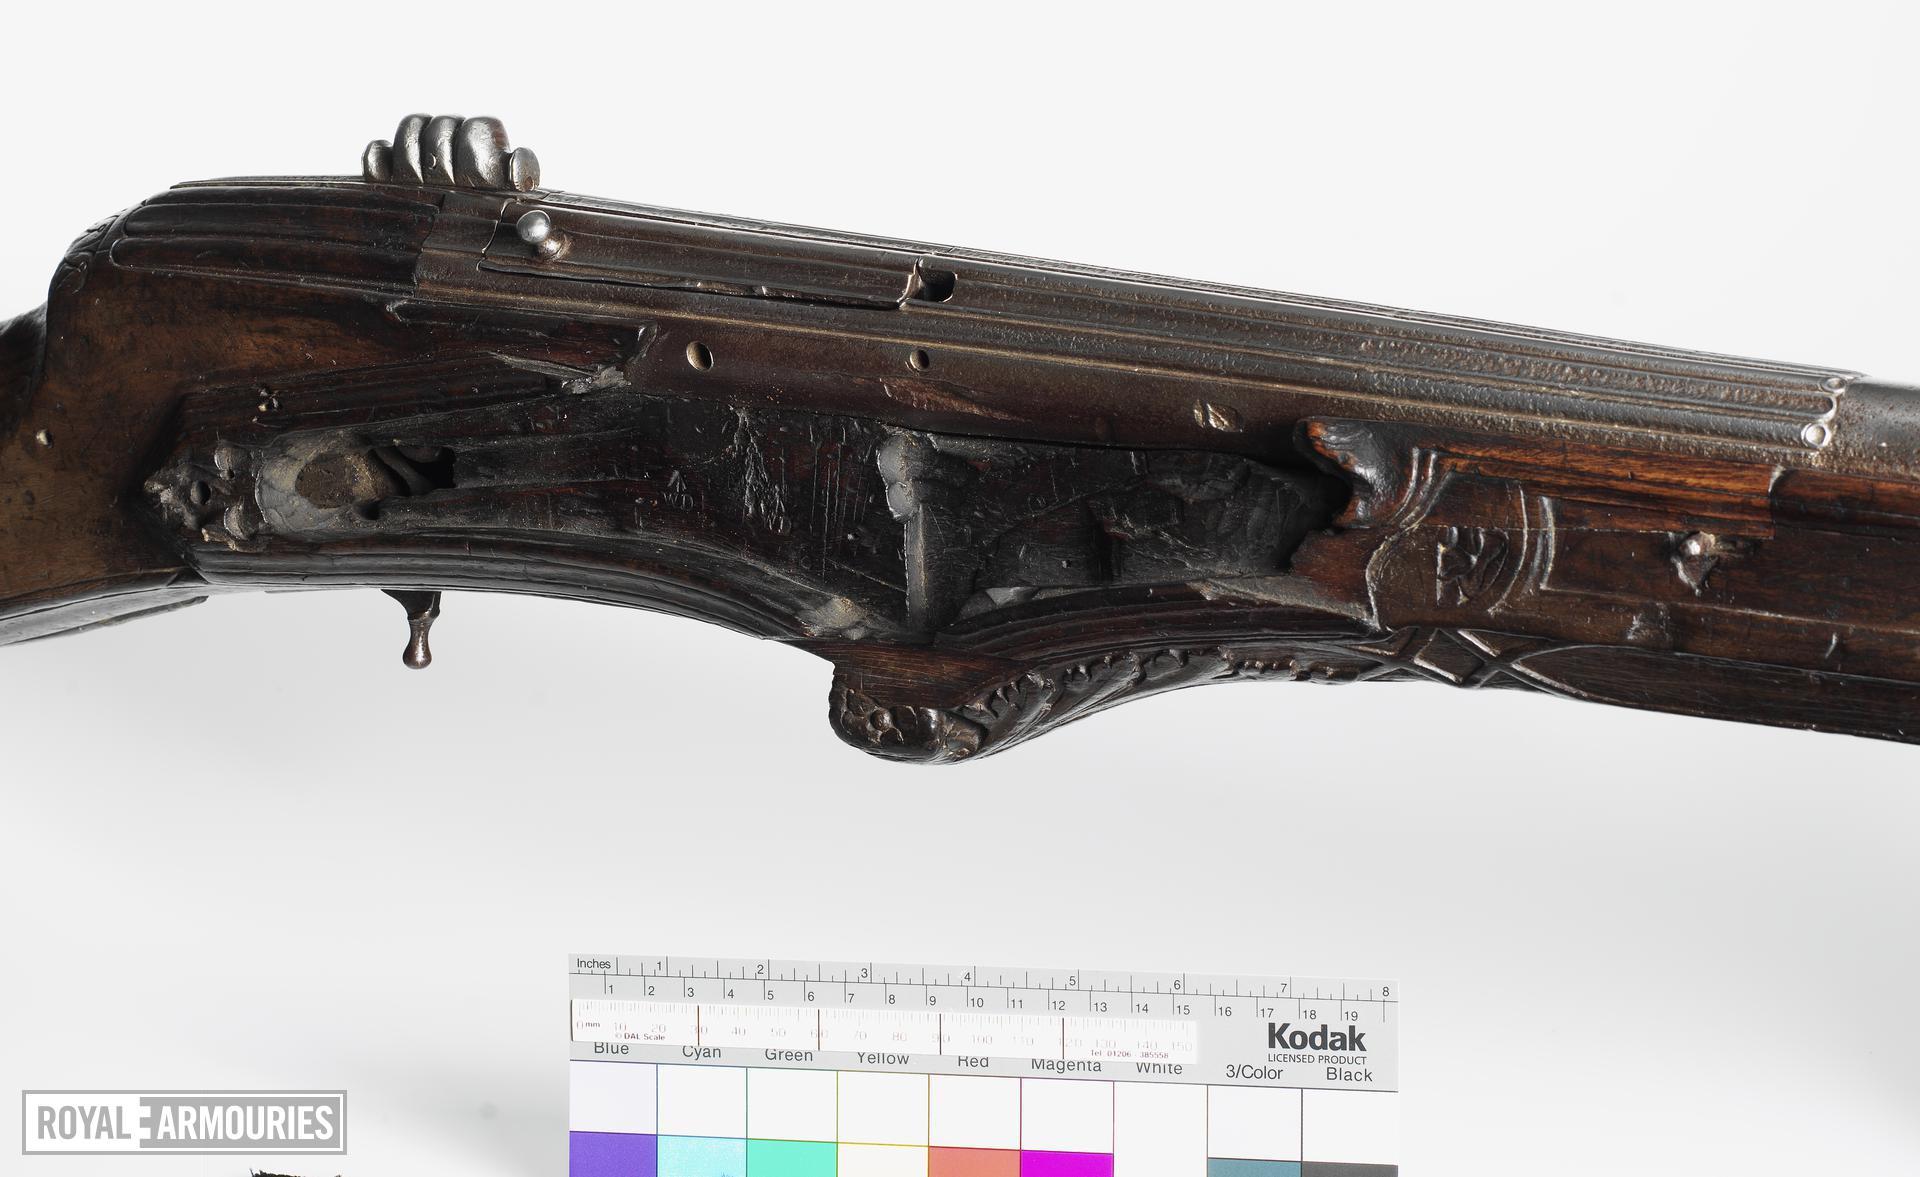 Wheellock breech-loading gun